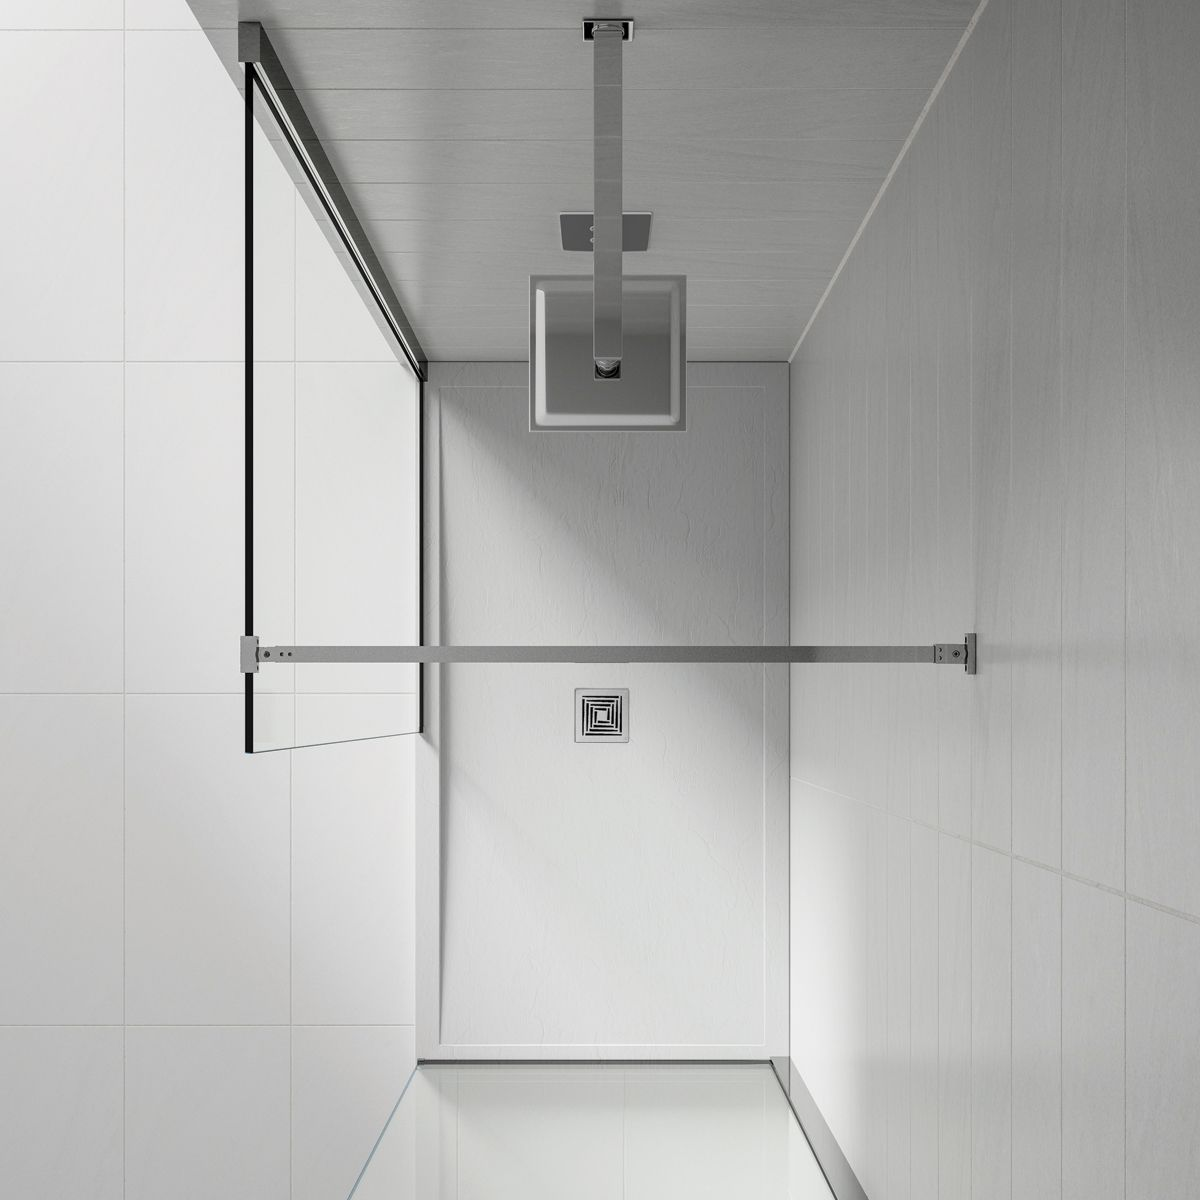 Aquadart White Slate Shower Tray 1600 x 900 Overhead